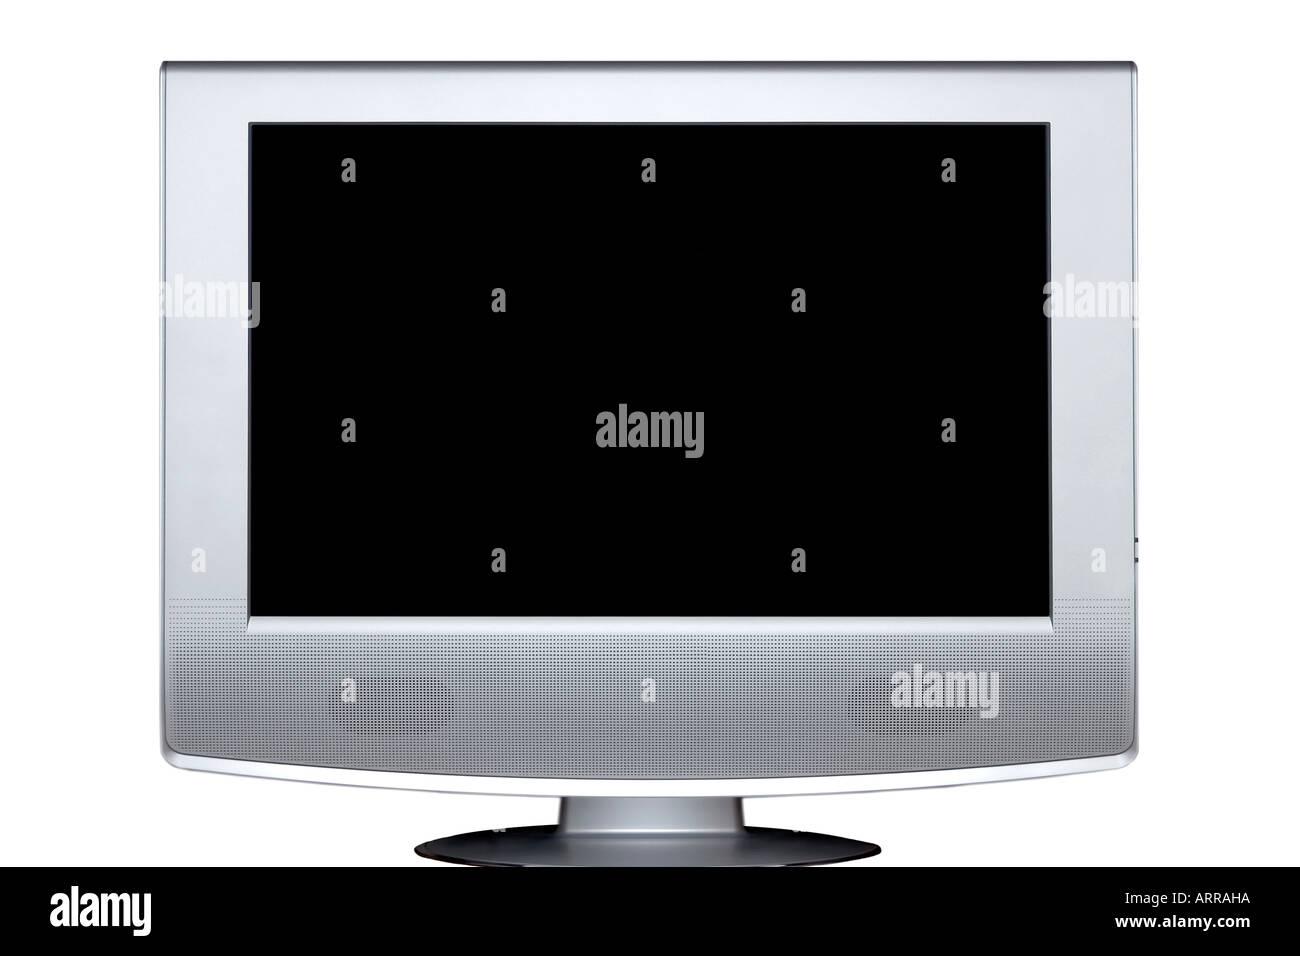 Modern lcd flat tft stereo hd tv television - Stock Image